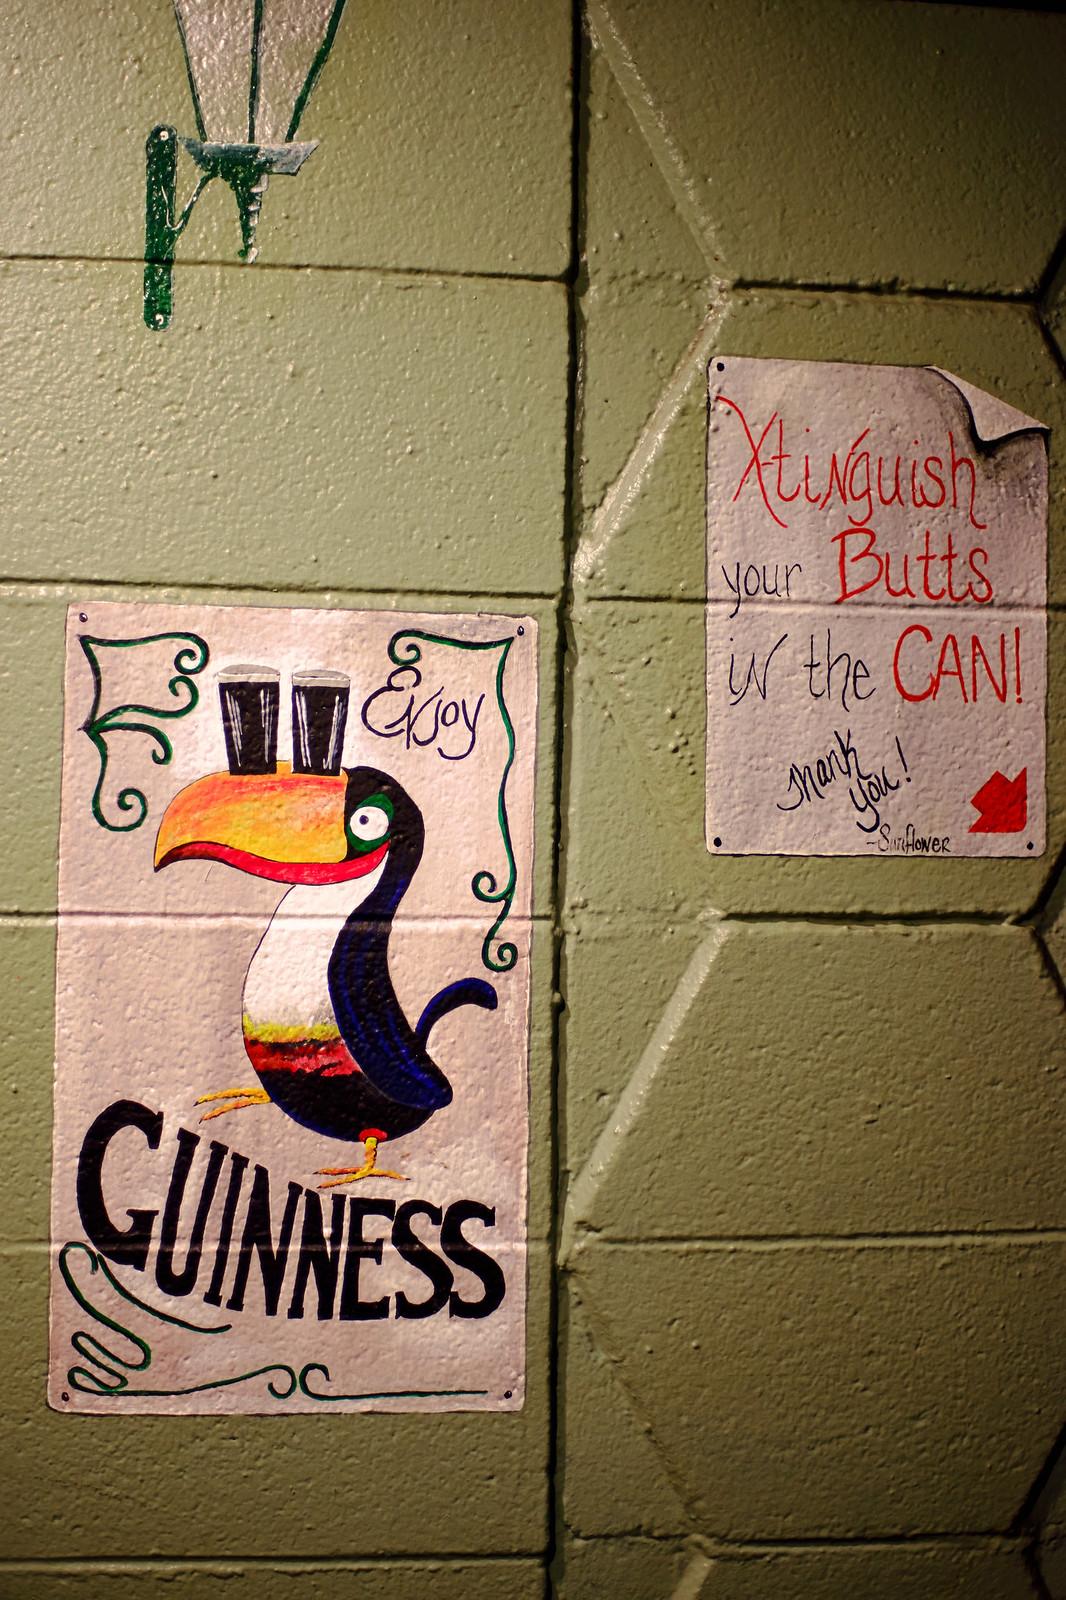 St. Patrick's Day Prefunk - 聖派翠克節提前慶祝